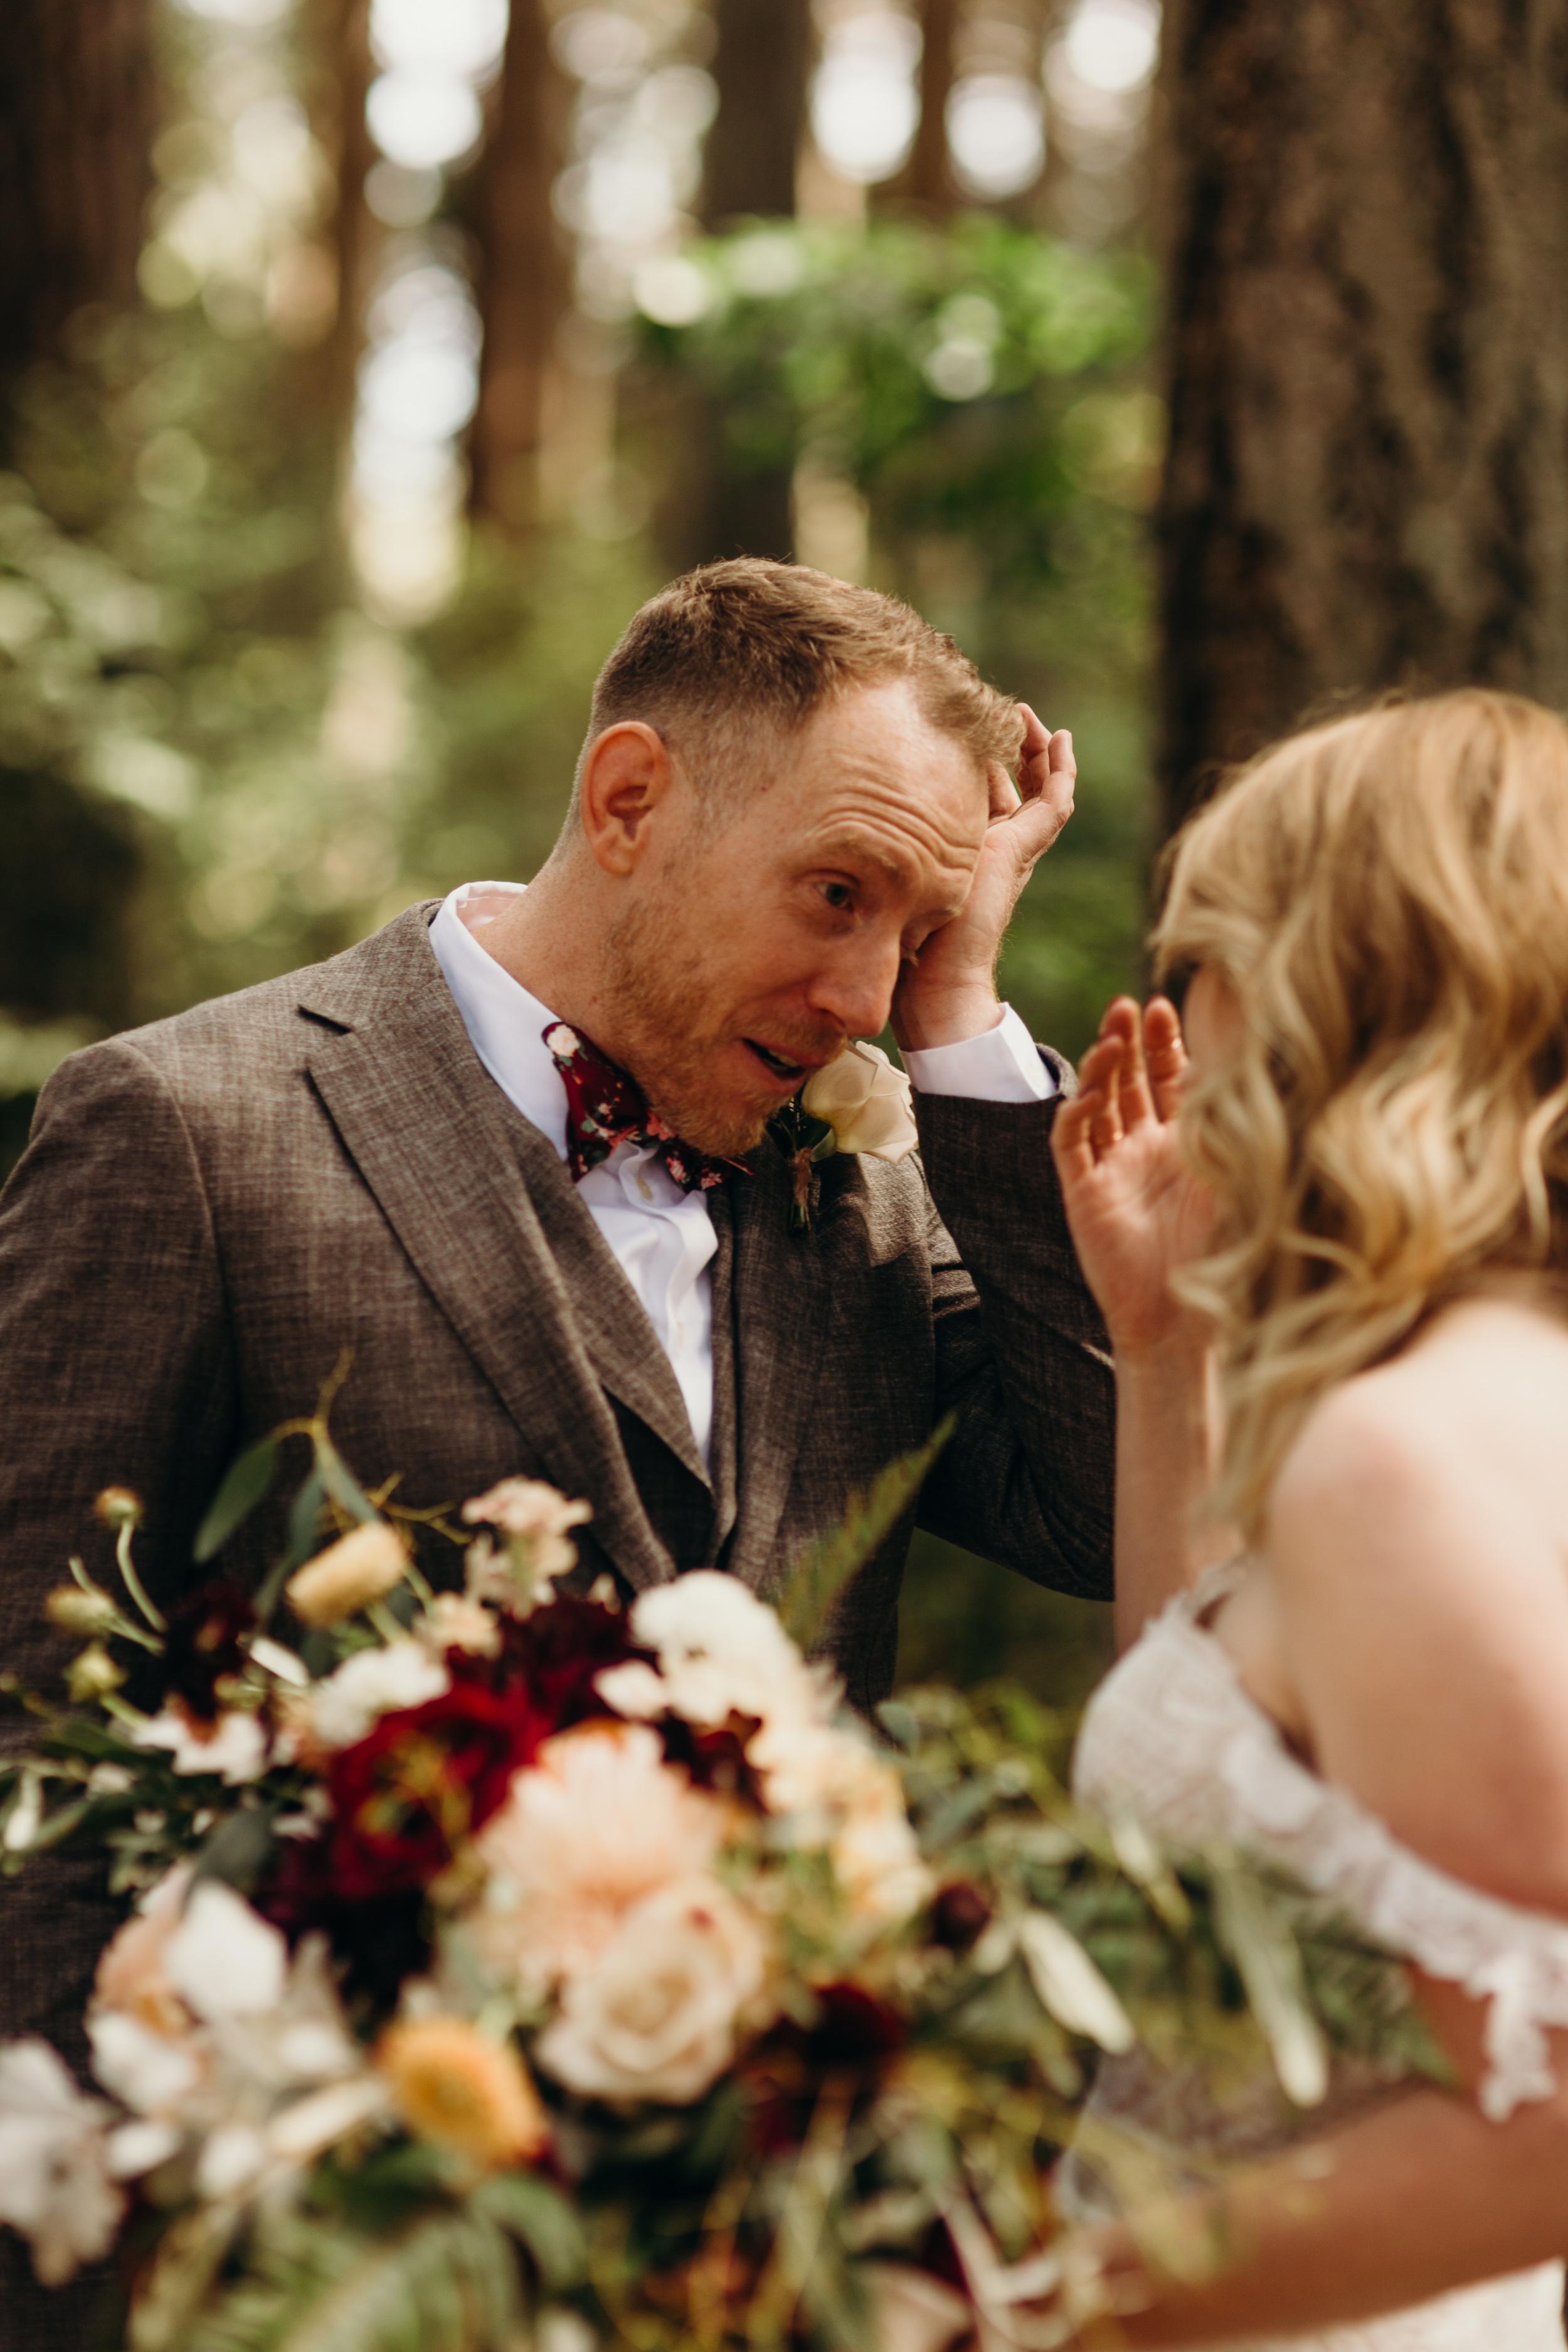 ashley and peter kitsap memorial state park outdoor wedding first look van gachnang photography